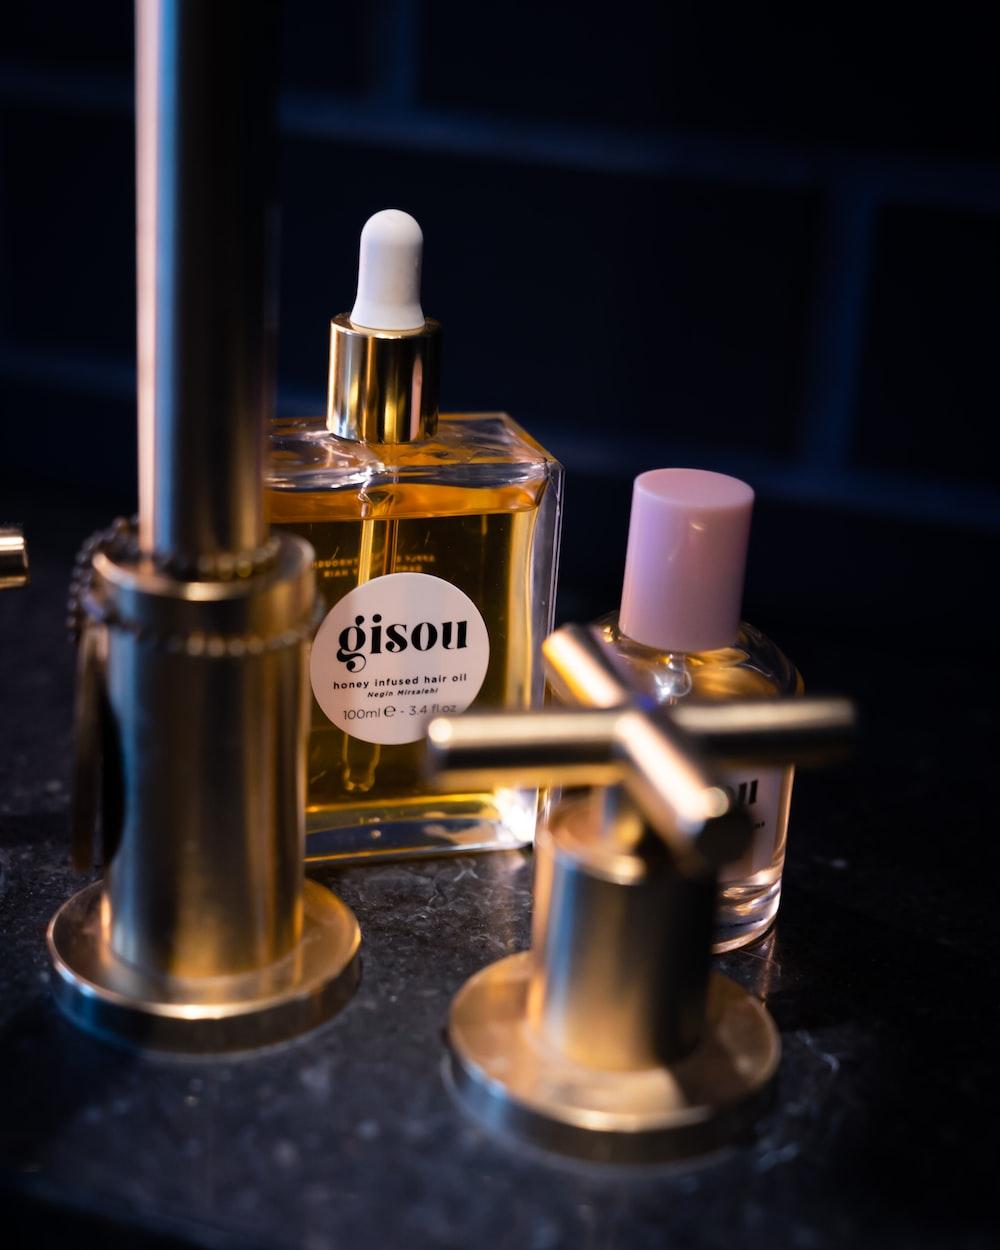 two perfume bottles on black table